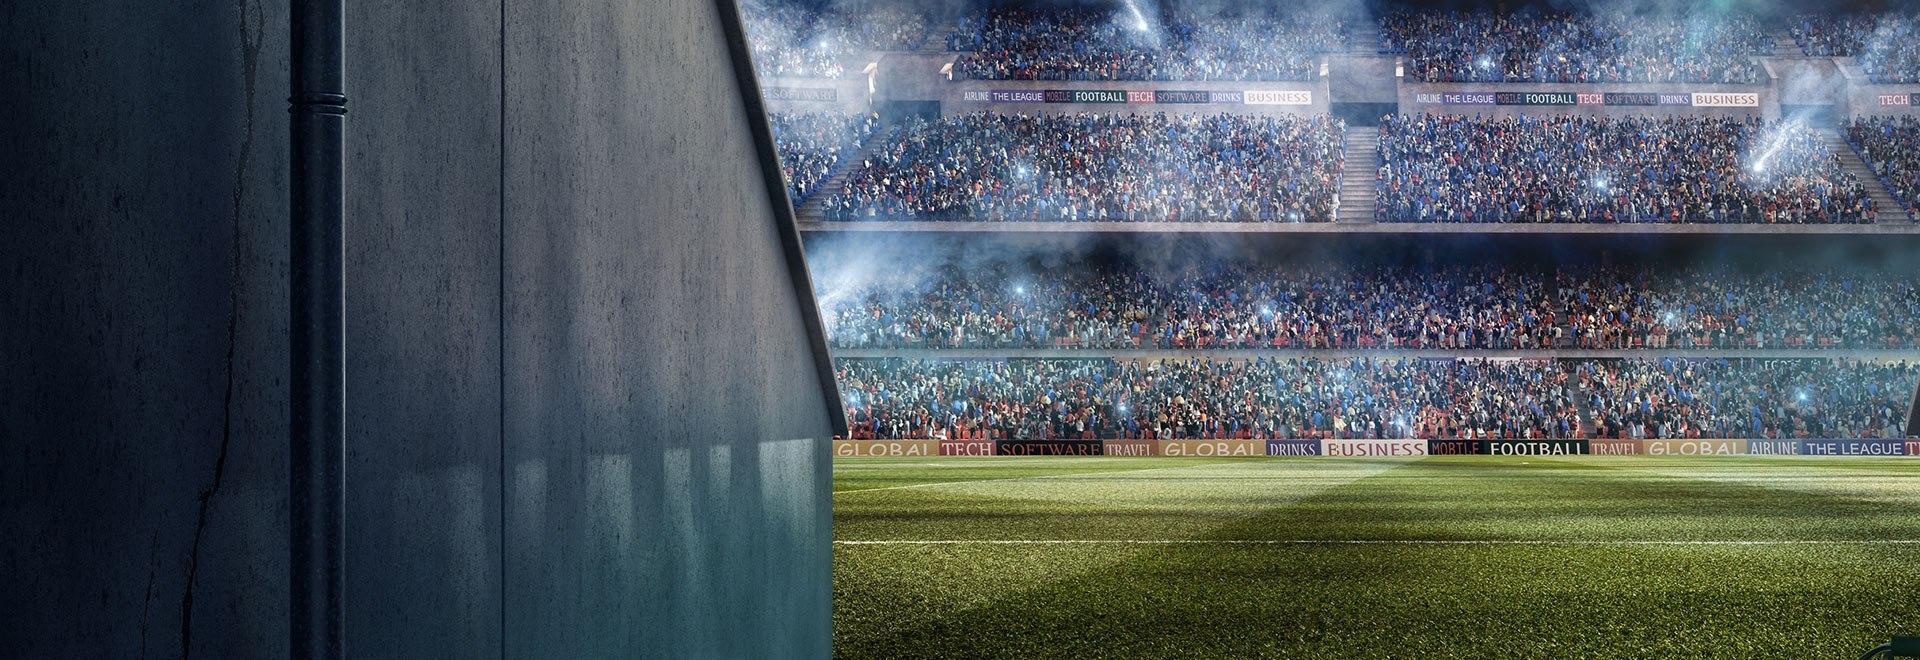 Palermo - Avellino. Playoff 1° turno Nazionale Andata